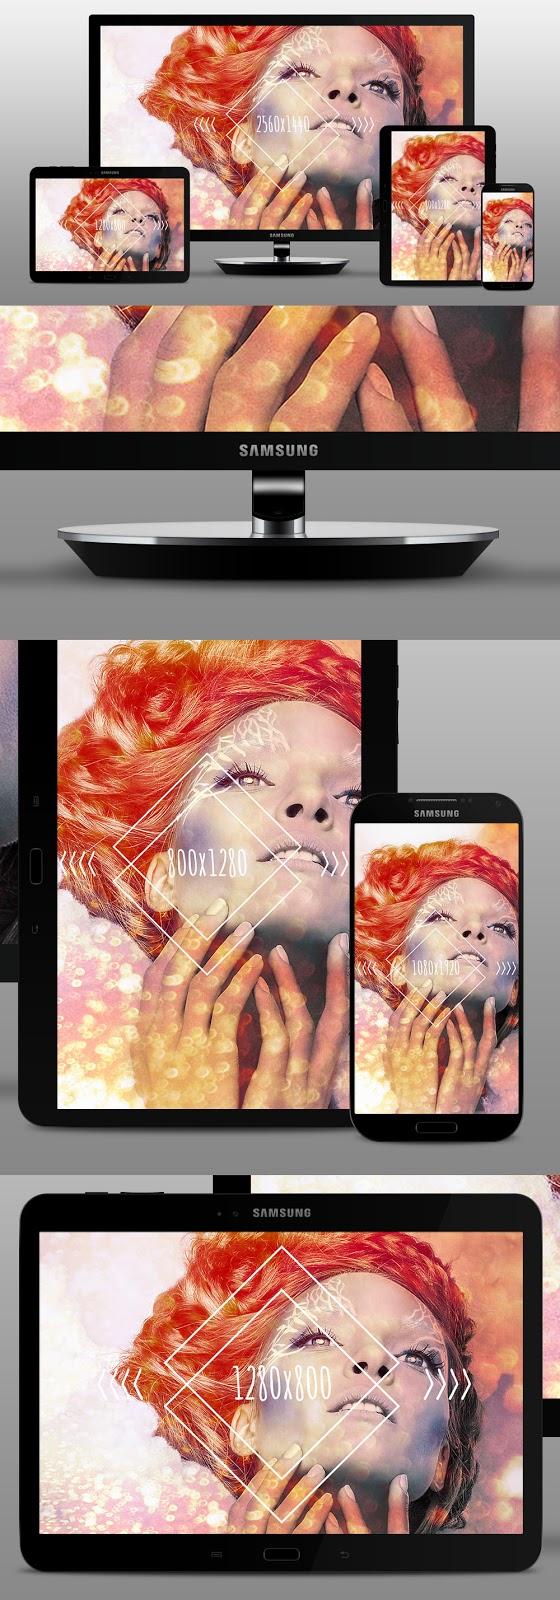 Samsung Device Mockup